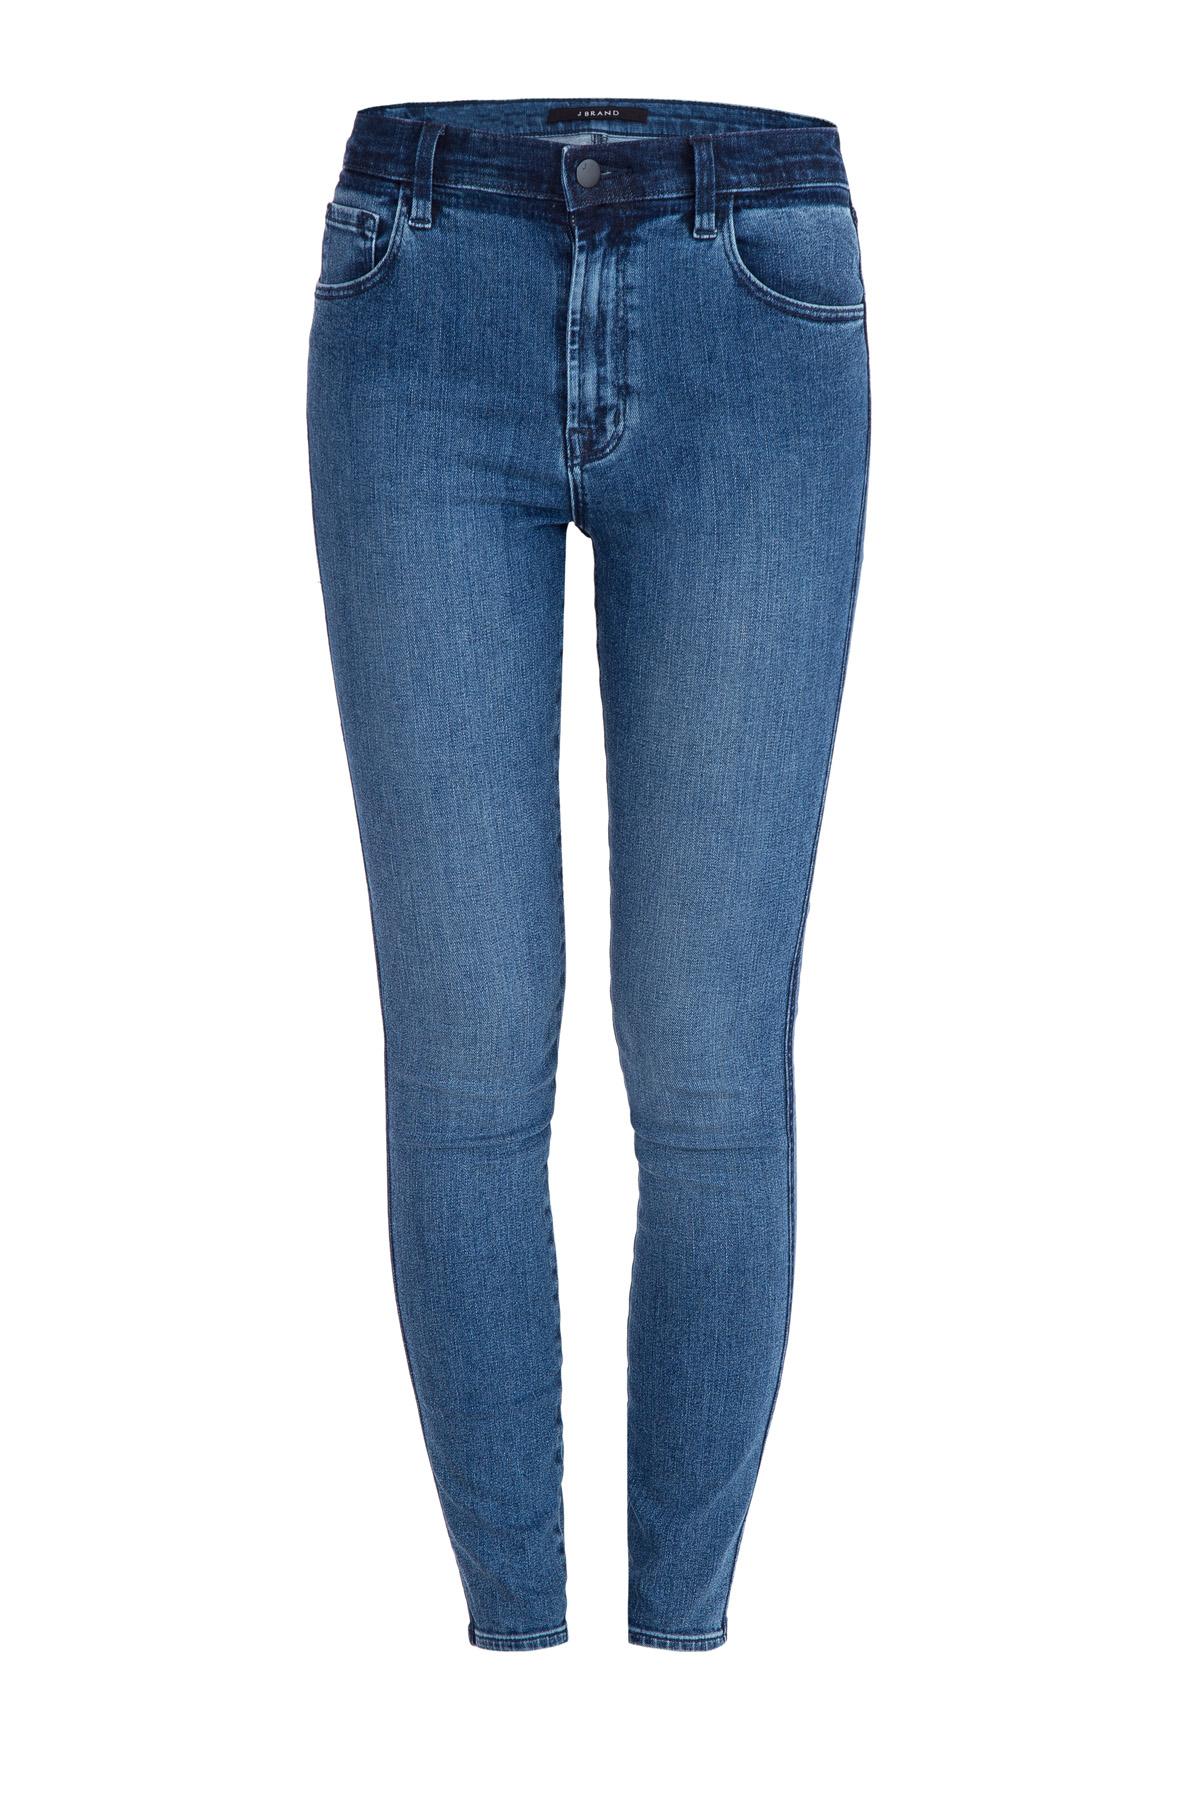 джинсыДжинсы<br><br>Материал: хлопок 98% ,  полиуретан 2%;